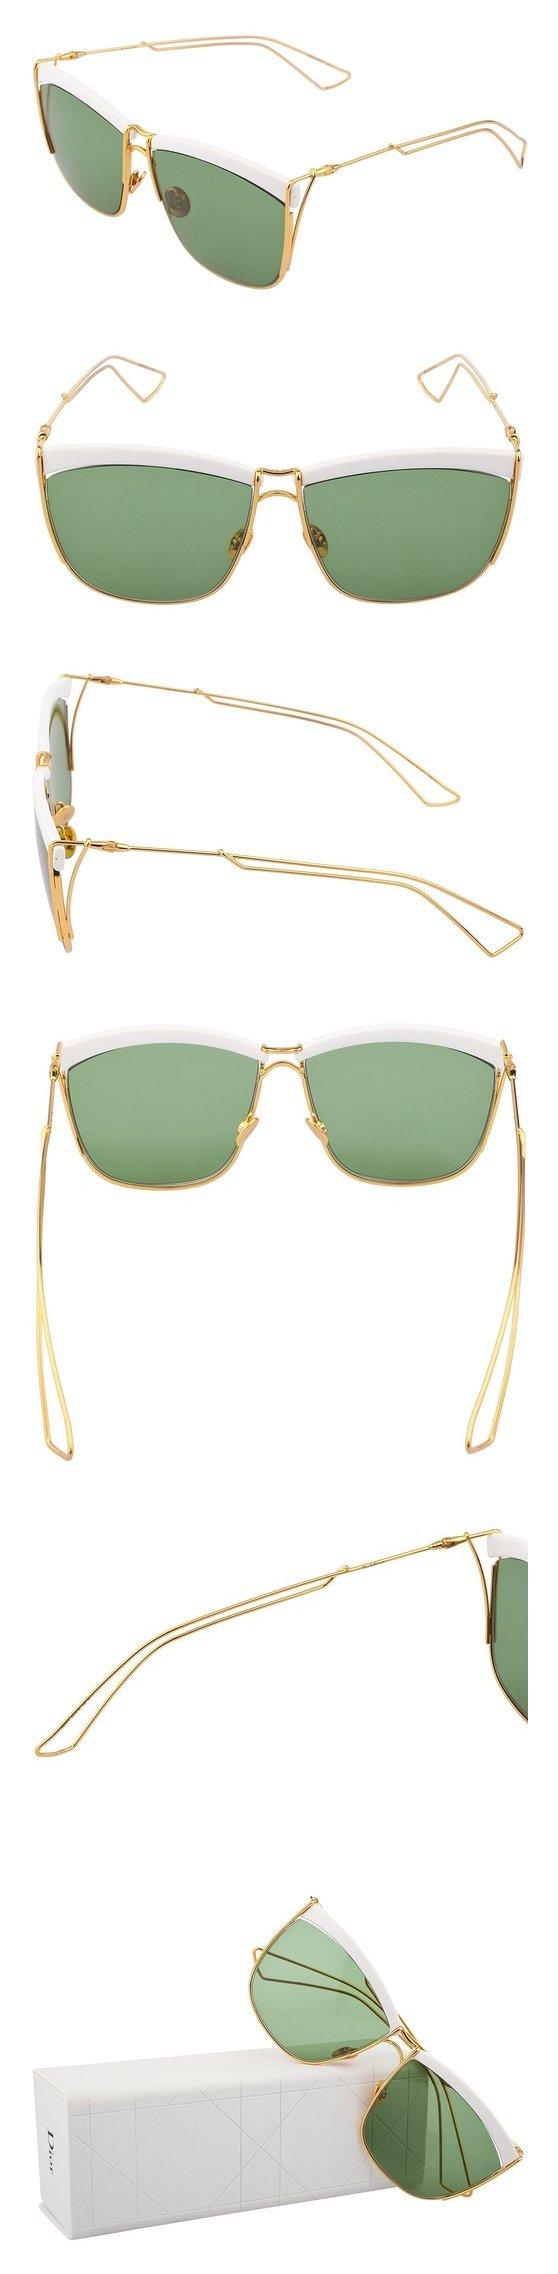 2d7d4d1e84 Christian Dior Sunglasses SO ELECTRIC 266DJ White Gold Frame Green Lens   apparel  eyewear  christiandior  sunglasses  shops  men  departments